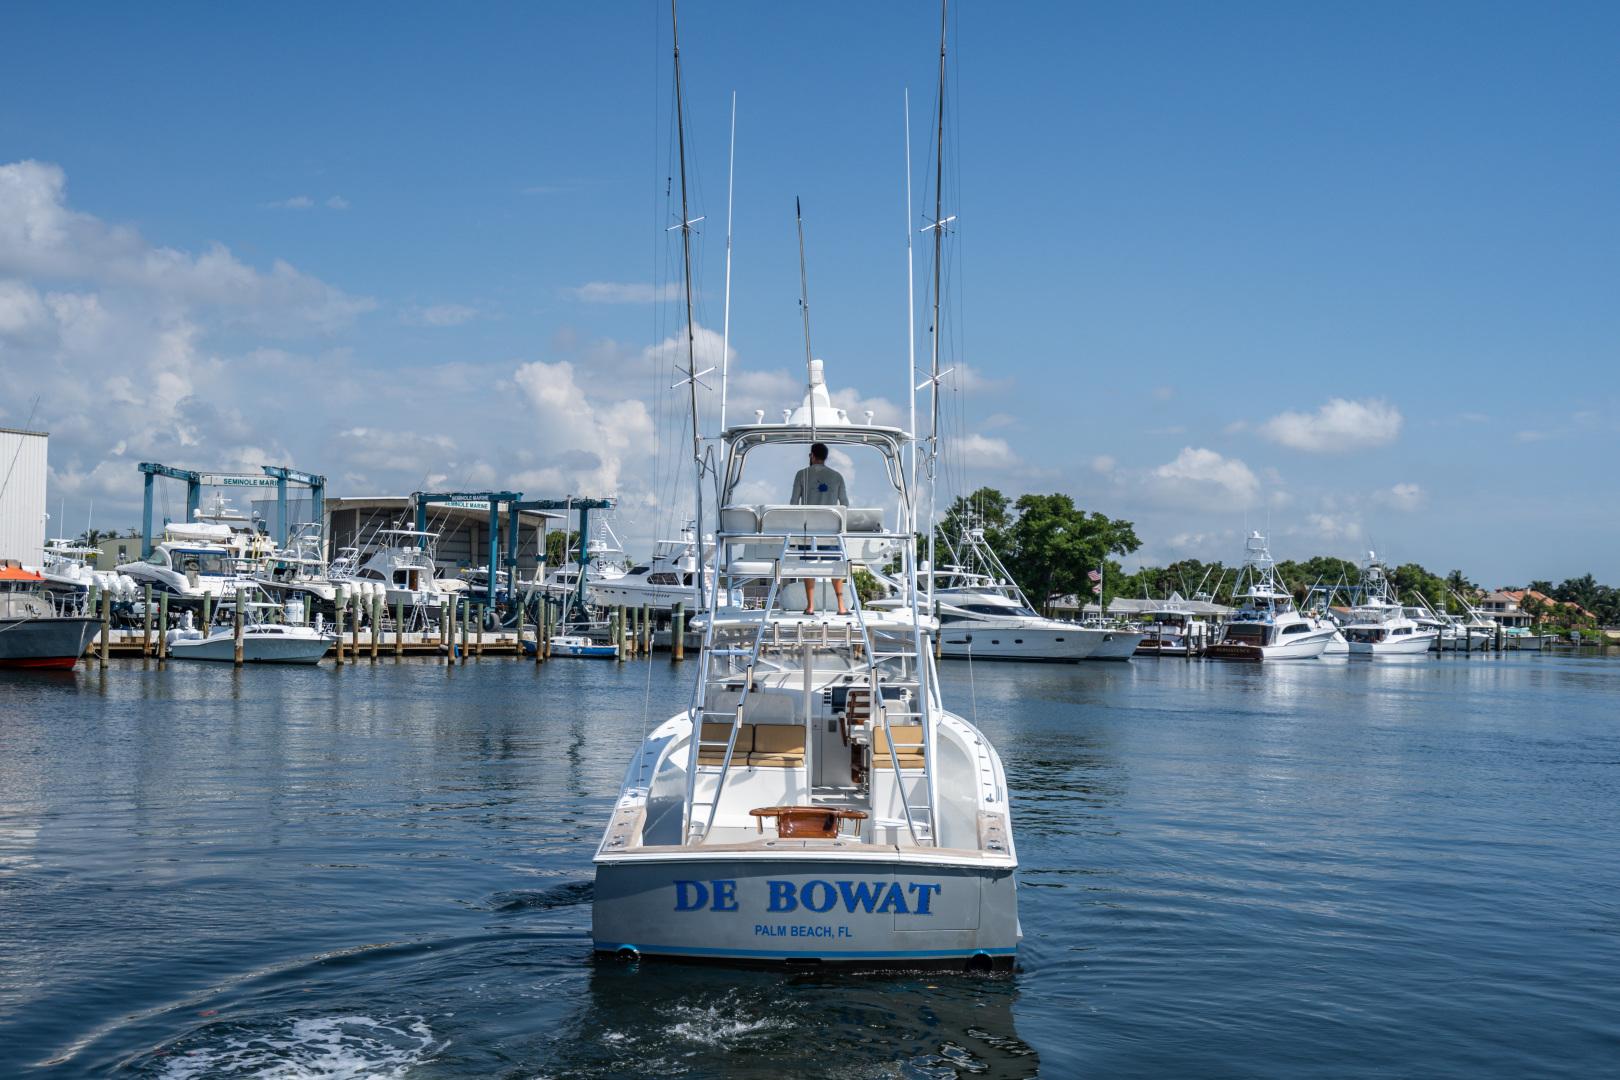 Release-Walkaround 2014-De Bowat Palm Beach Gardens-United States-1364478 | Thumbnail